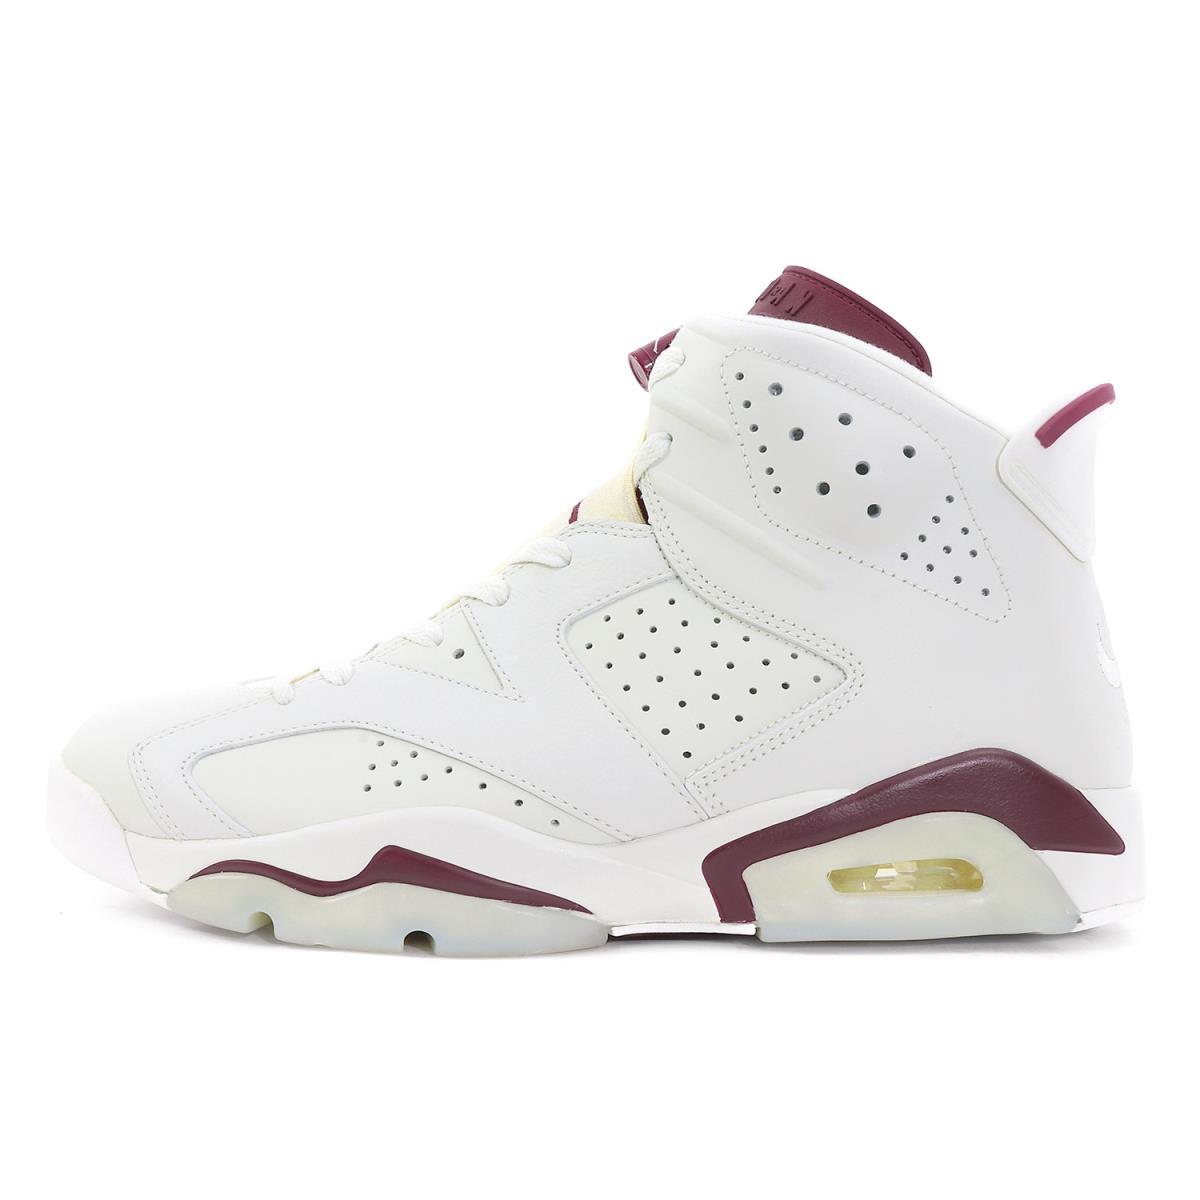 sports shoes cc7ba b424f NIKE (Nike) AIR JORDAN 6 RETRO MAROON (384,664-116) off-white X new Marron  US10.5(28.5cm)